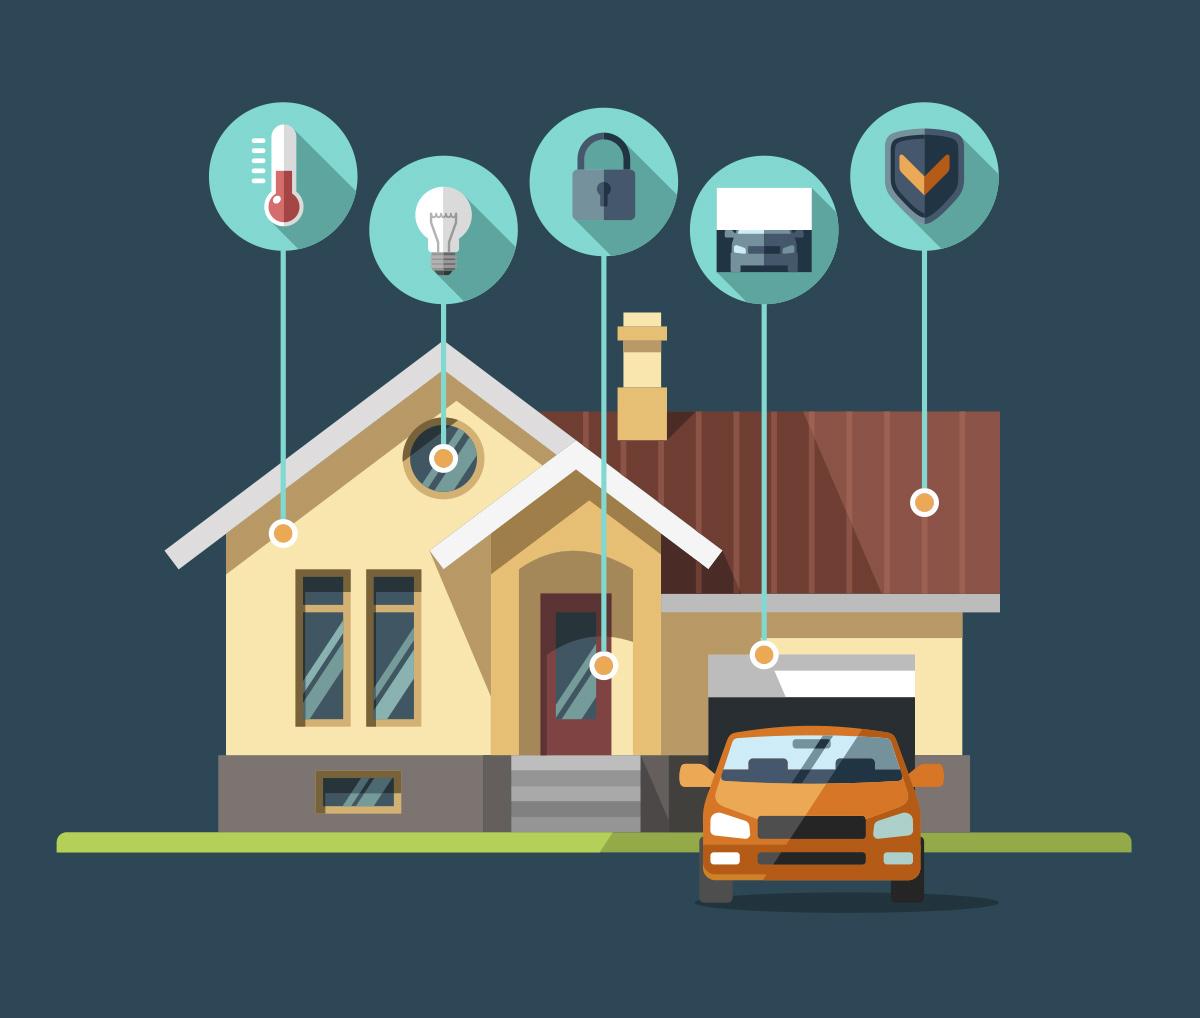 DeJiāVU Smart House